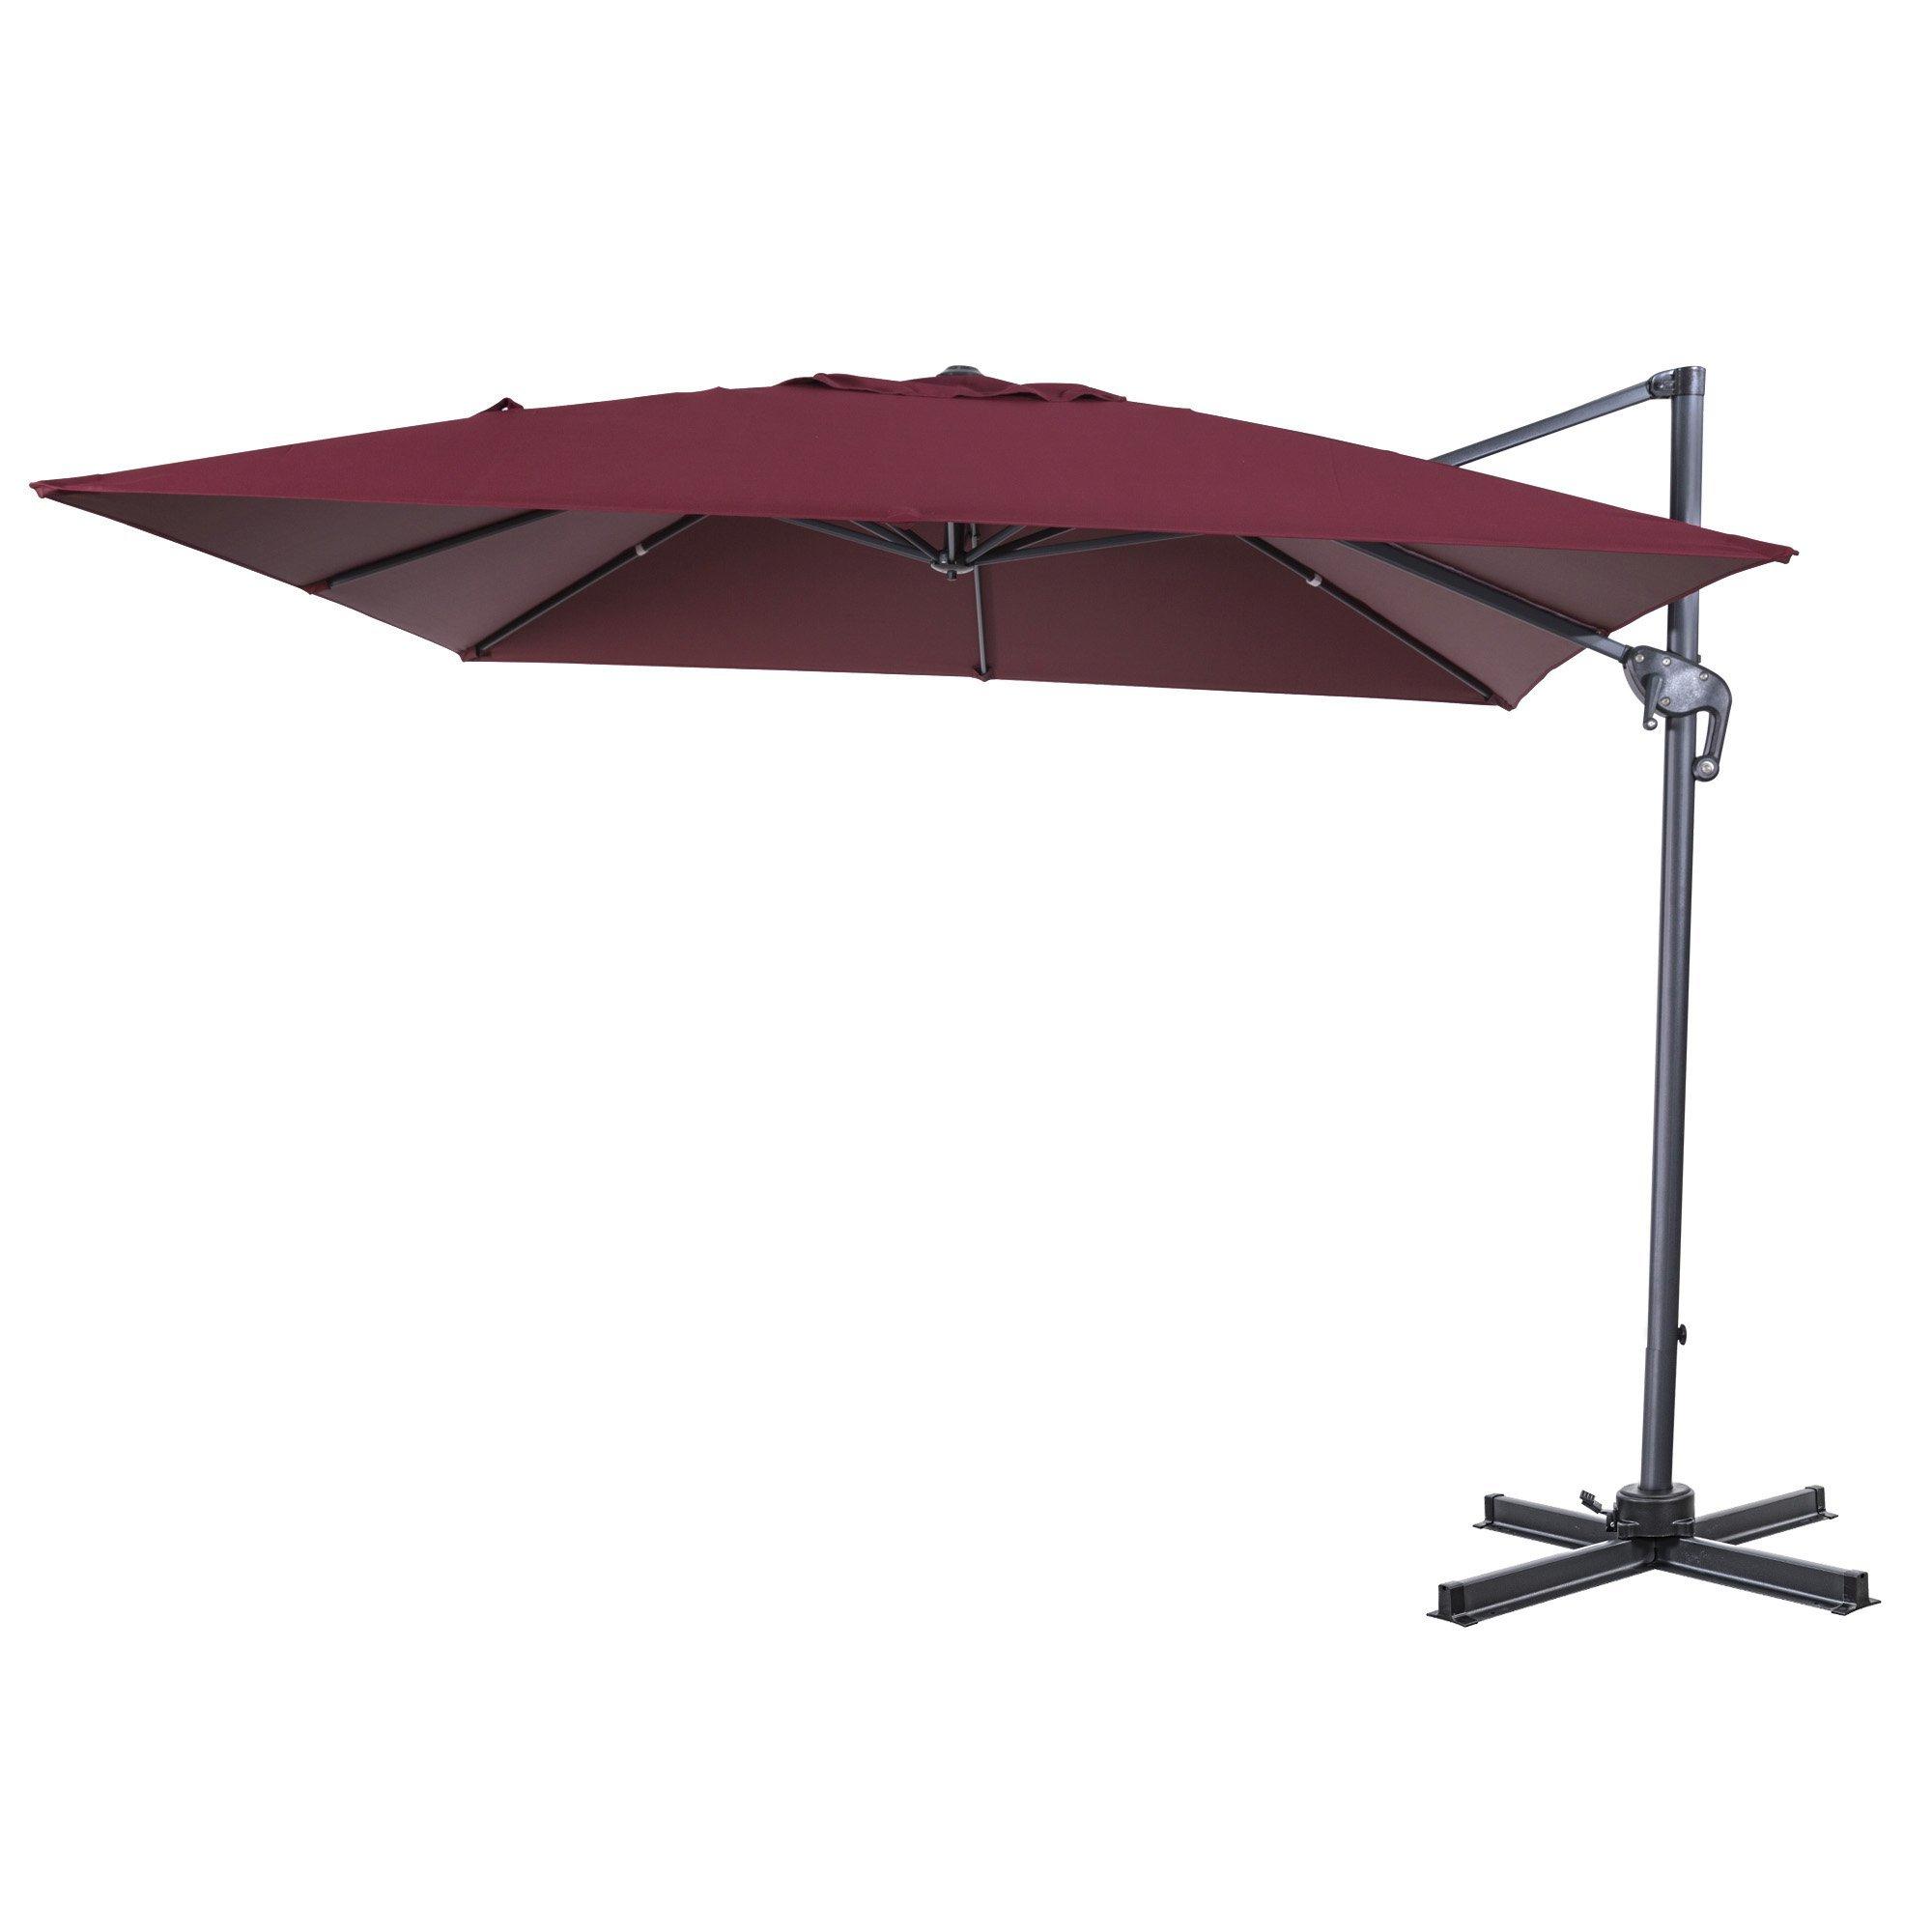 Favorite Elmhur Patio Offset 10' Cantilever Umbrella For Trotman Cantilever Umbrellas (View 8 of 20)